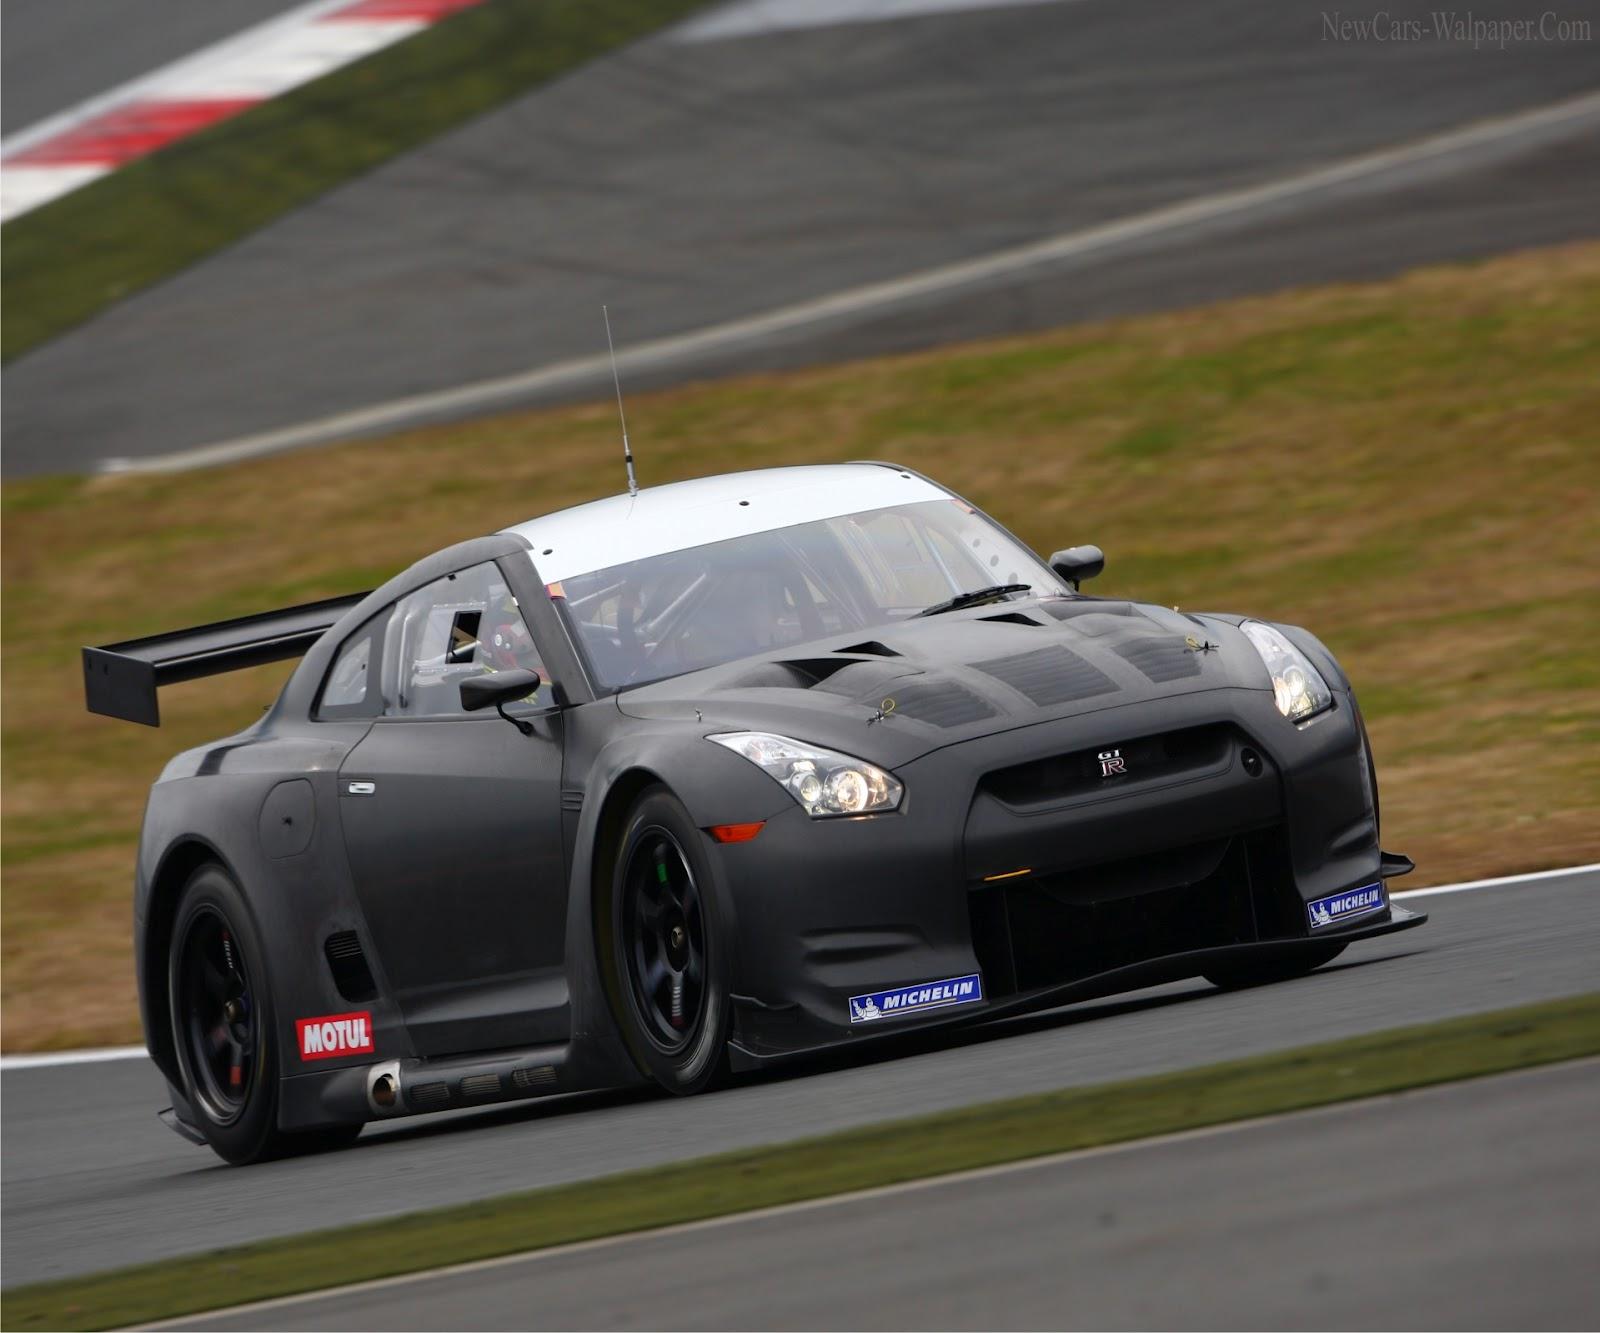 http://4.bp.blogspot.com/-Qkey_vX0Erw/T0kav7VLzFI/AAAAAAAAH_k/WDlgxCrPUDI/s1600/Nissan-GT-R-FIA-GT-2009.jpg